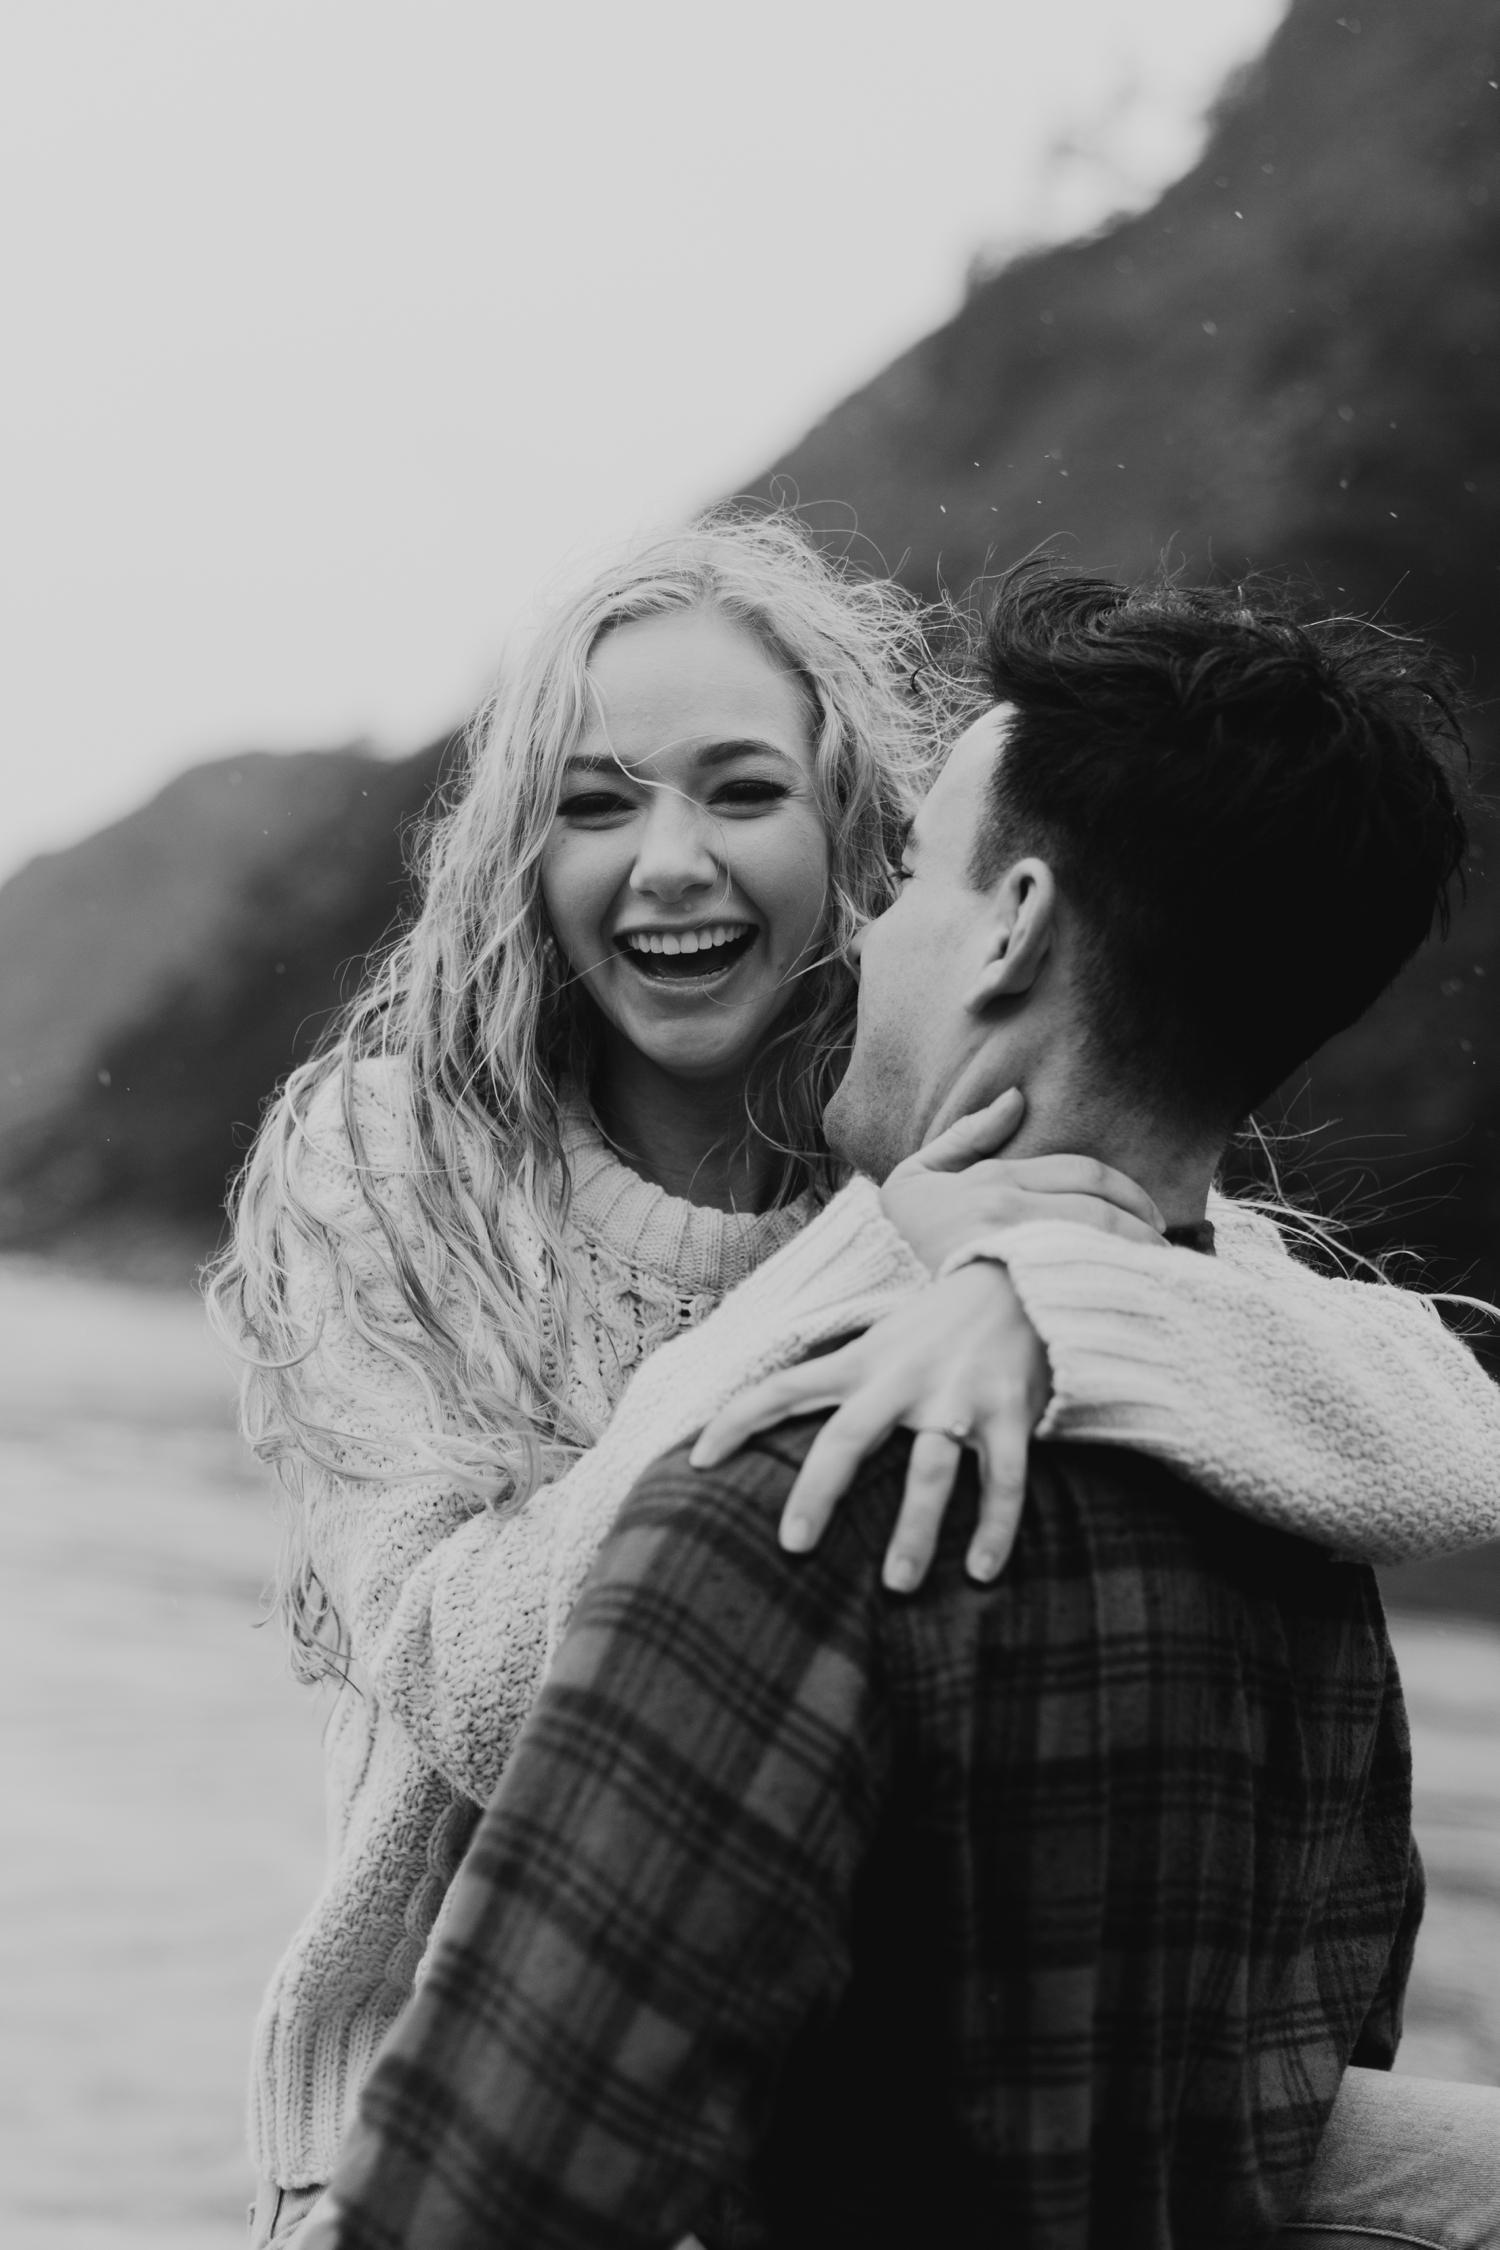 rainy-oregon-coast-adventure-couples-photography-2018-05-02_0102.jpg